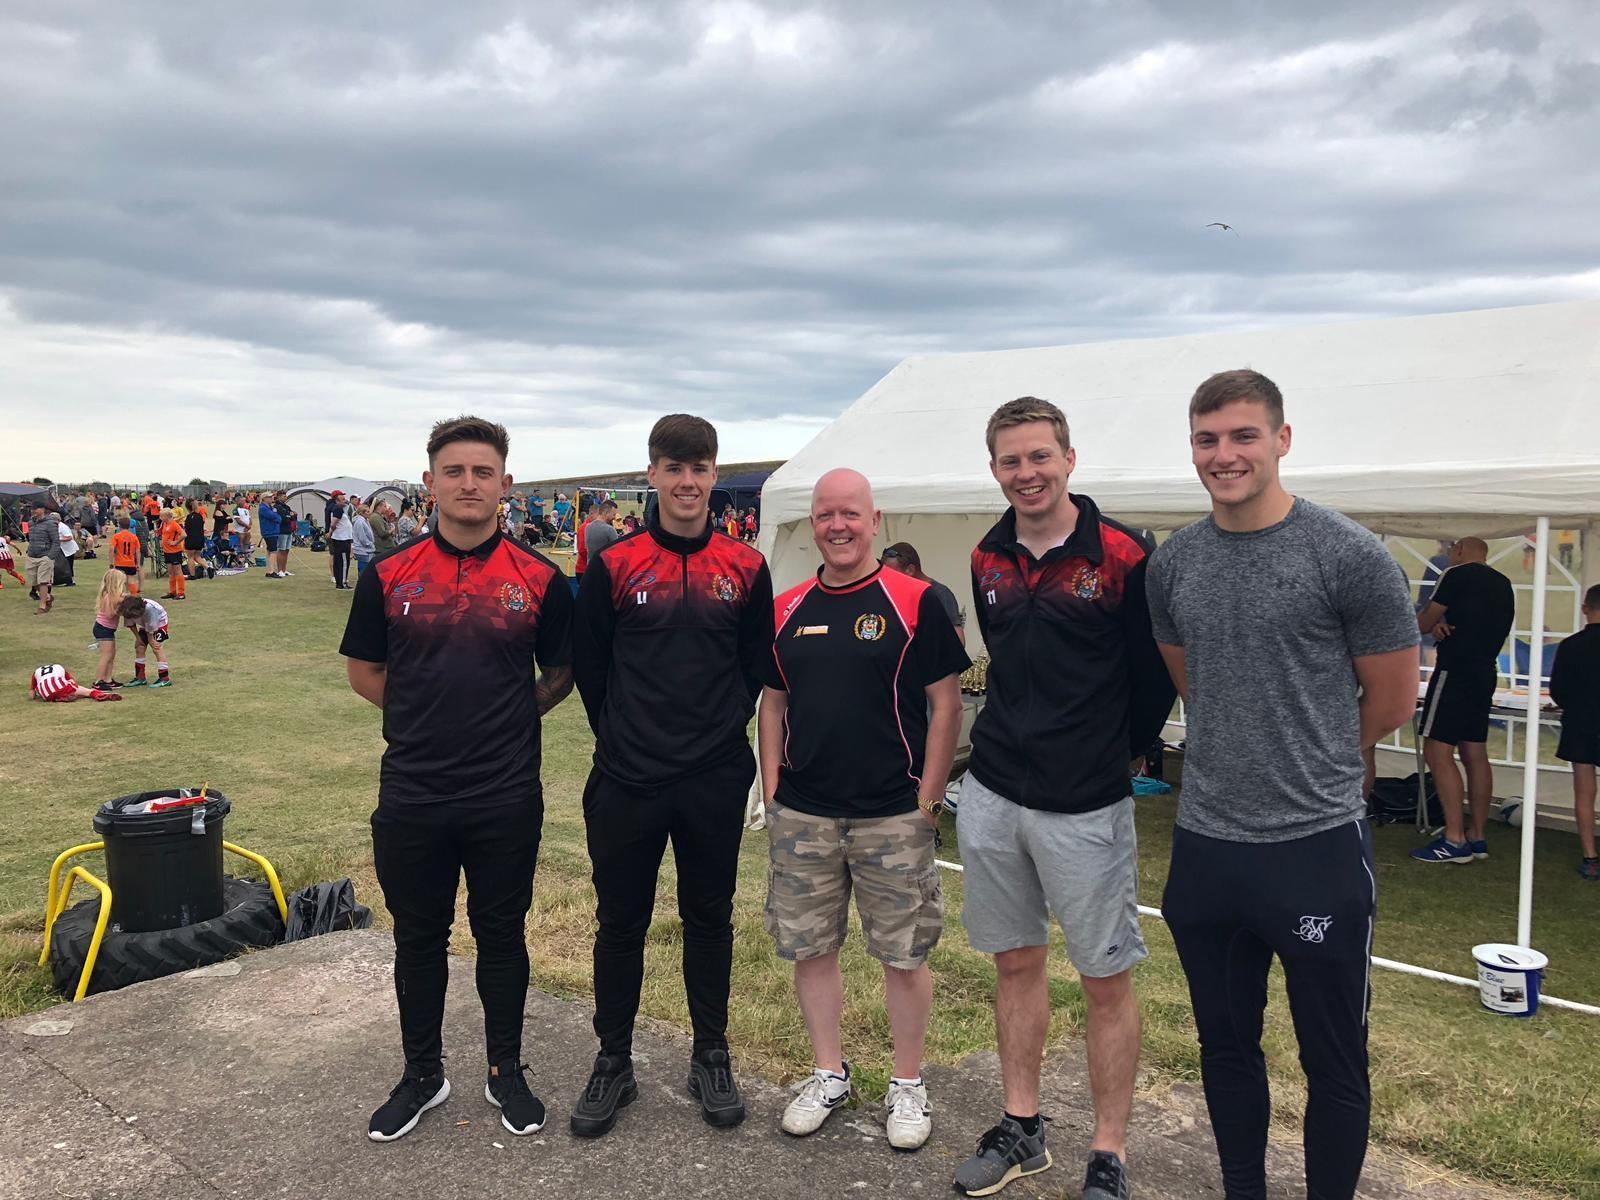 Dav Symington,  Luke Ivison, Conor Tinnion and Ash Kelly with Workington Reds Juniors' Simon Collins.